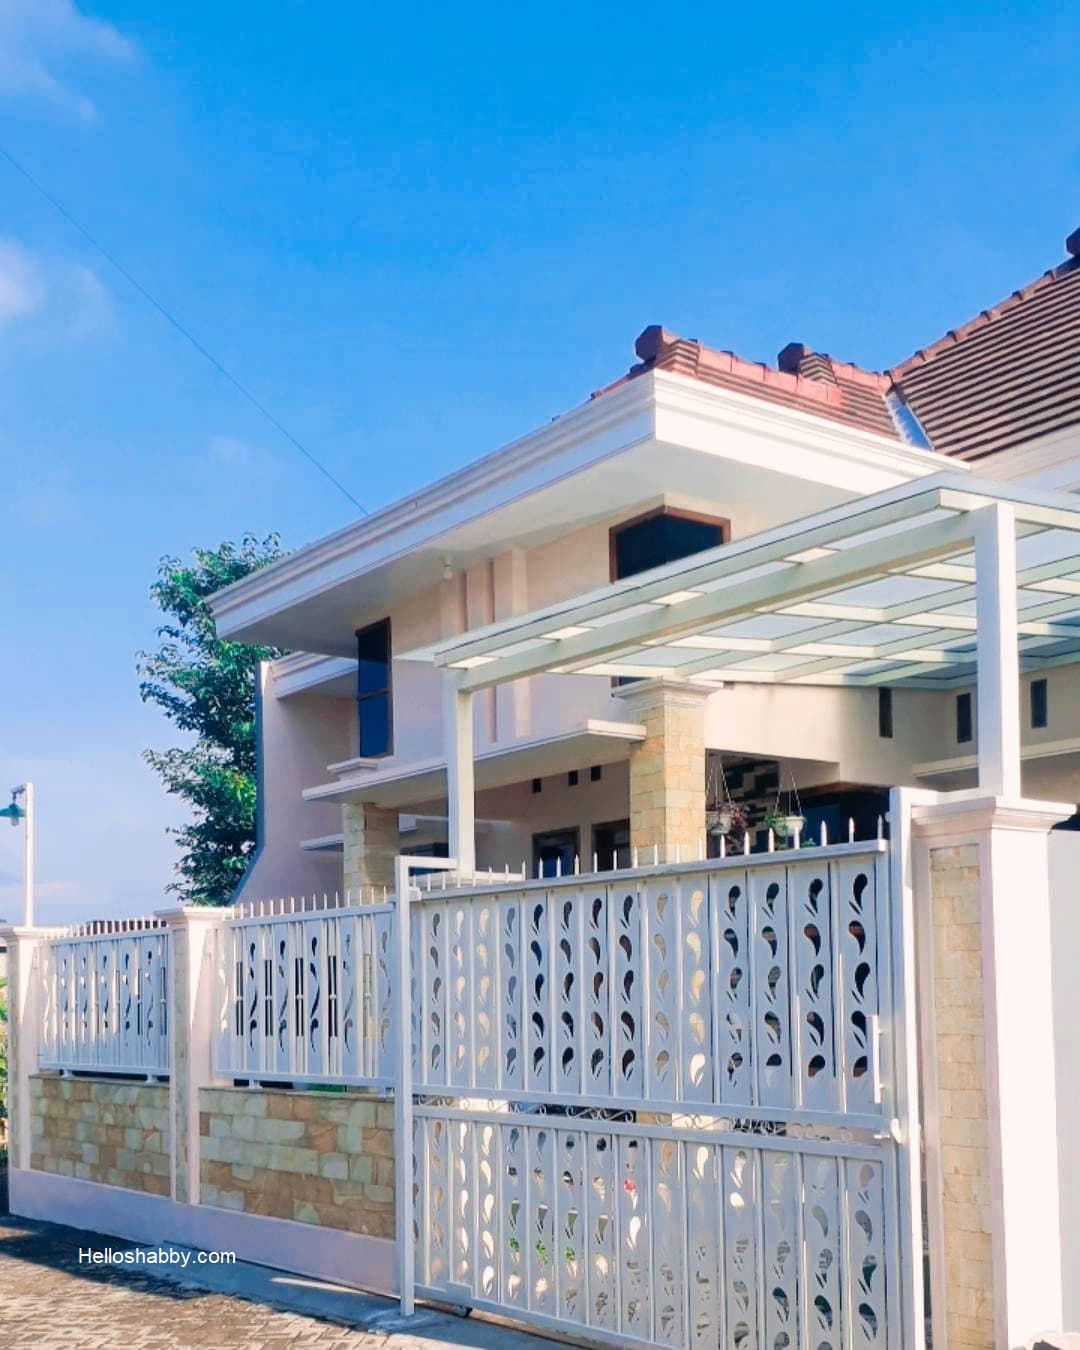 Modern Iron Gate Design Helloshabby Com Interior And Exterior Solutions